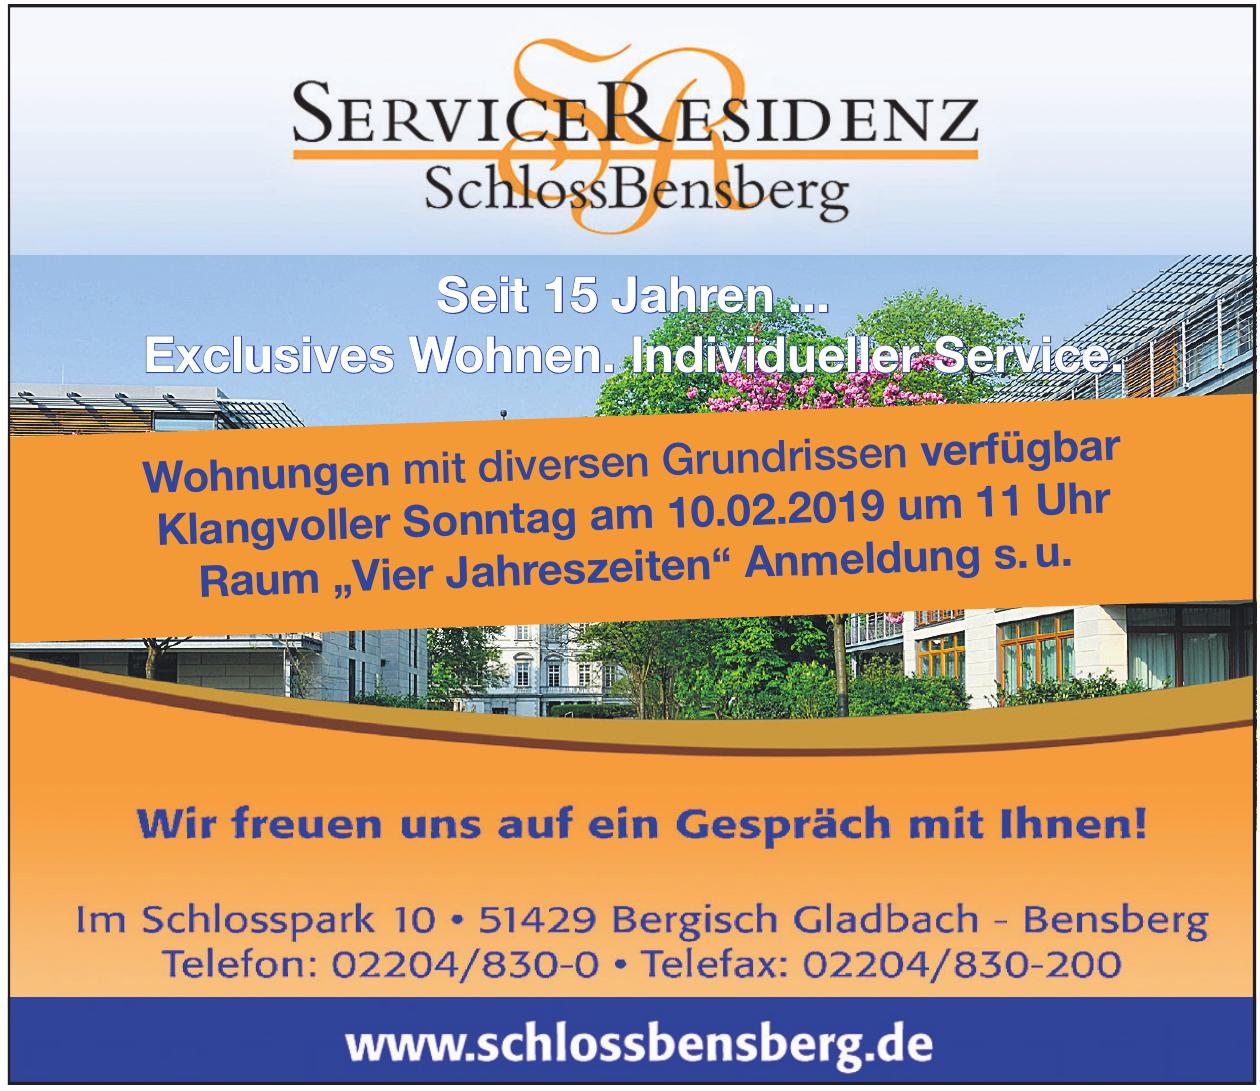 Service Residenz Schlossbensberg